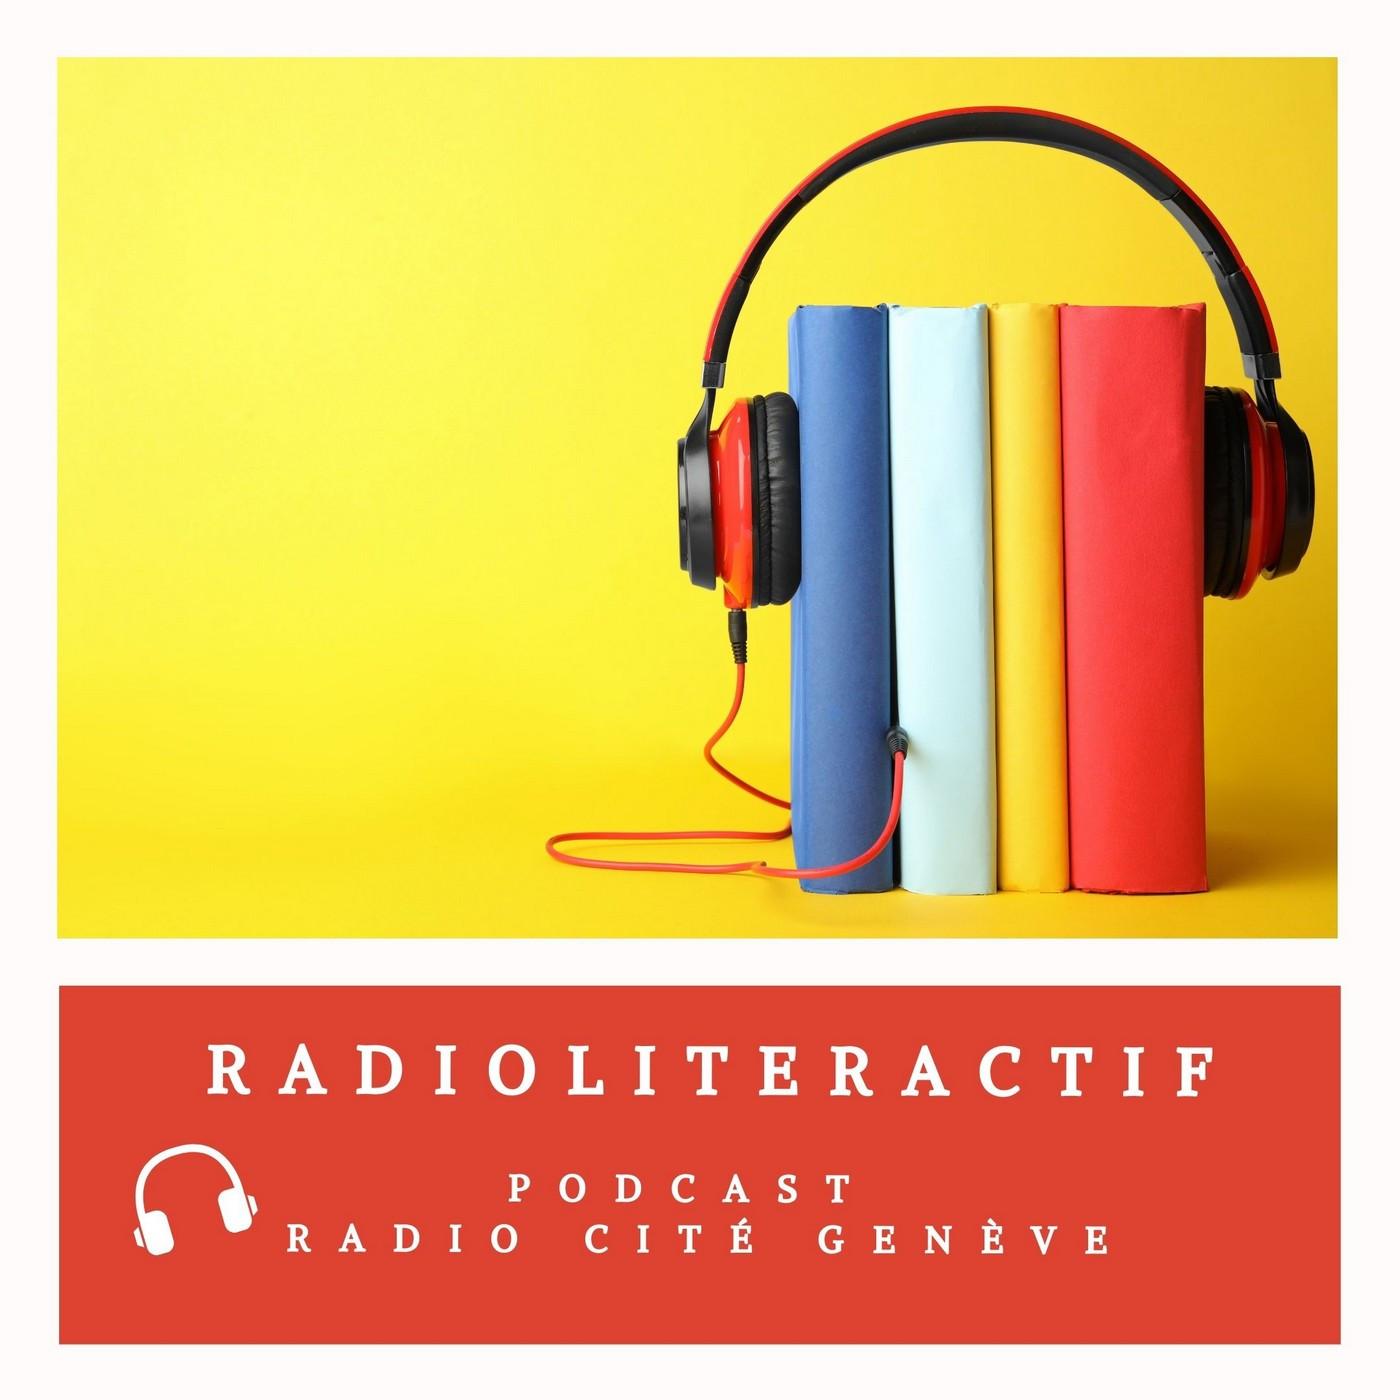 Radioliteractif du 18/01/2021 - Estelle Sohier